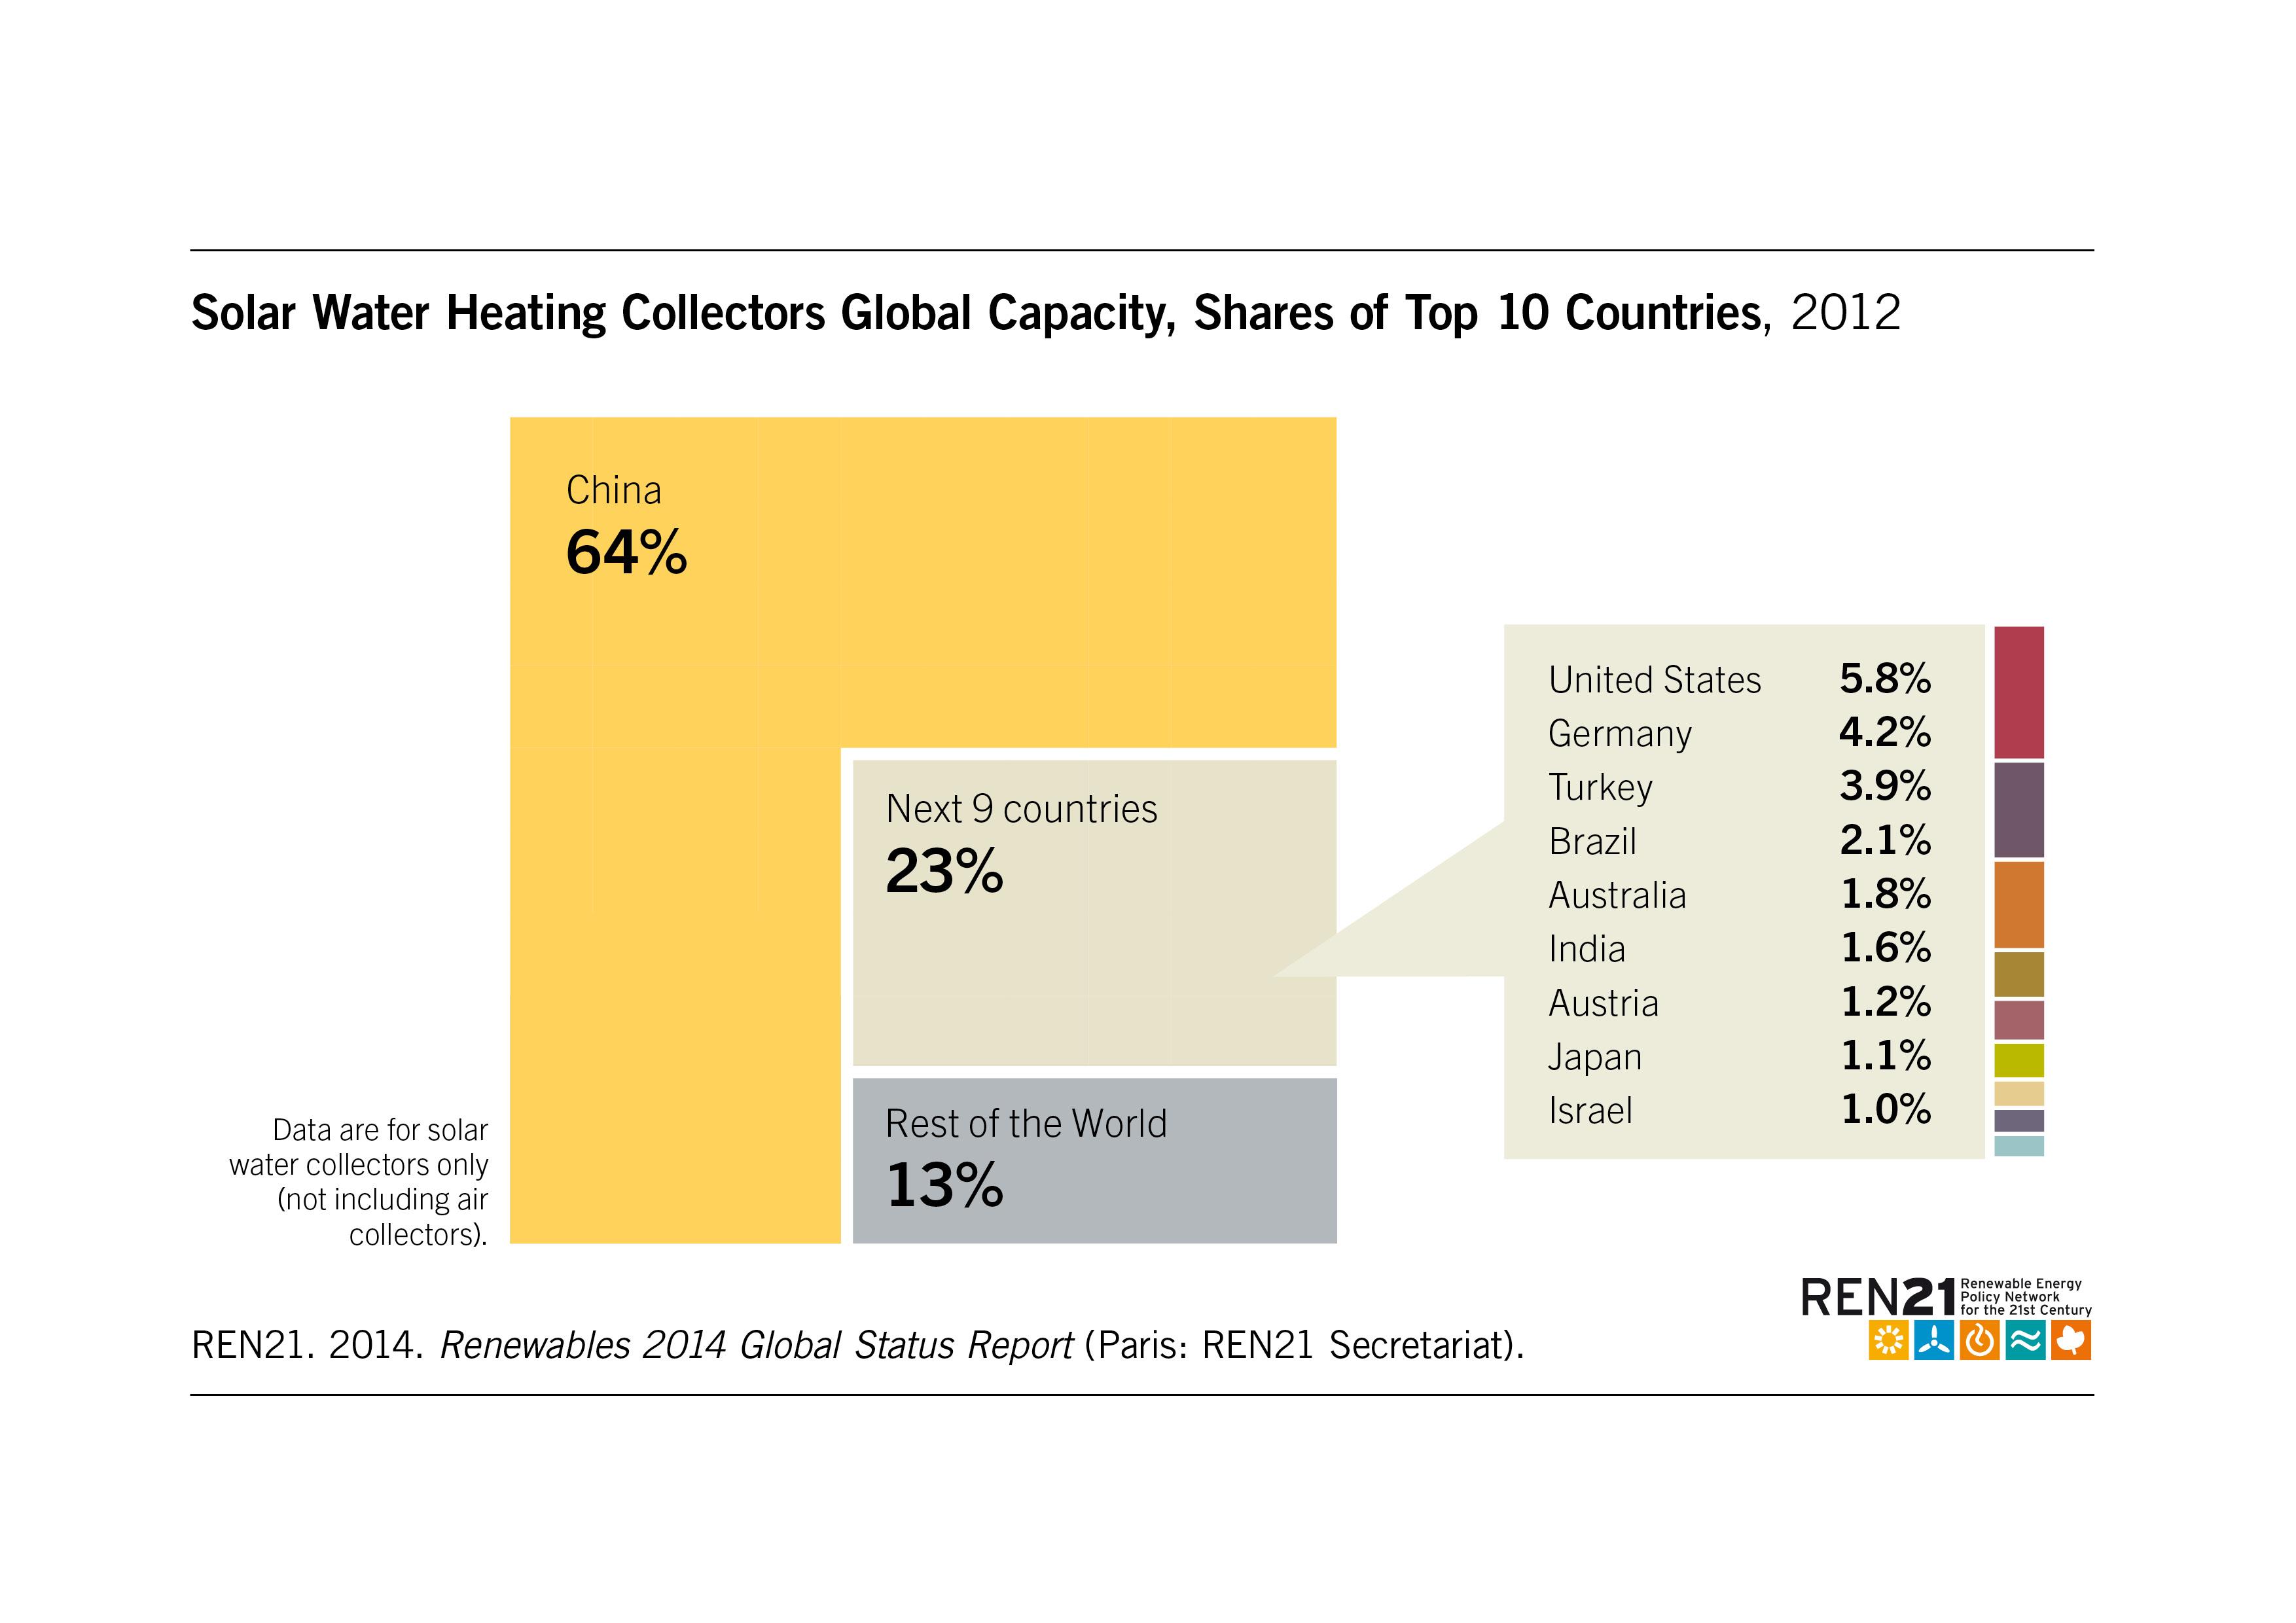 Renewables 2014 Global Status Report Iet Wiring Regulations Book 17th Edition Amendment 1 Pdf Next 9 Countries